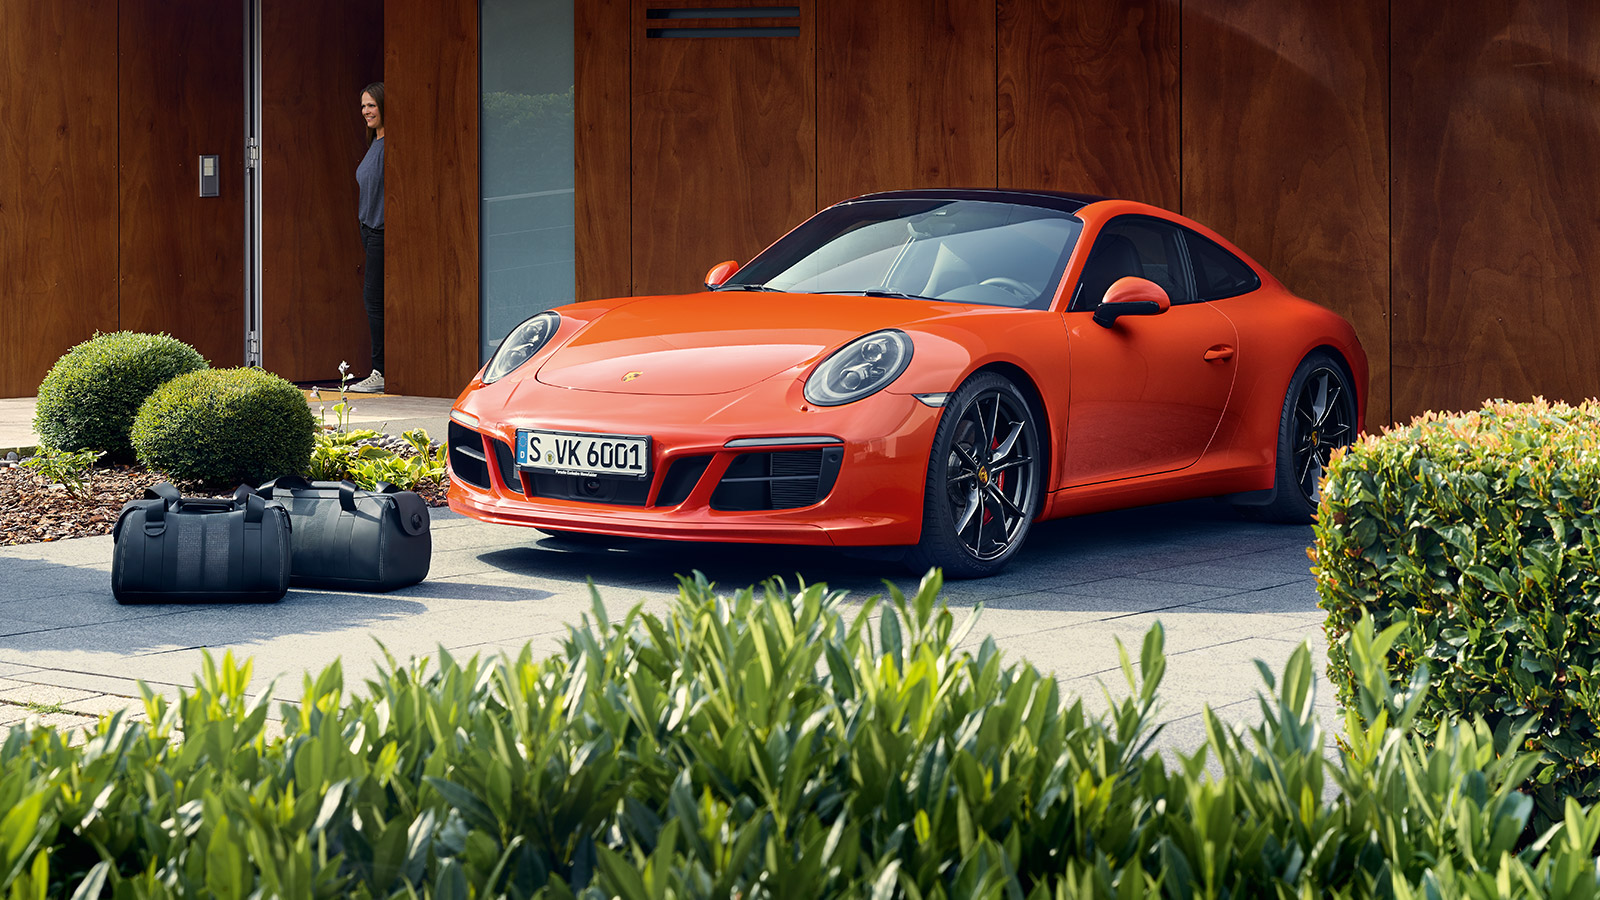 Porsche - Range of genuine accessories cont.